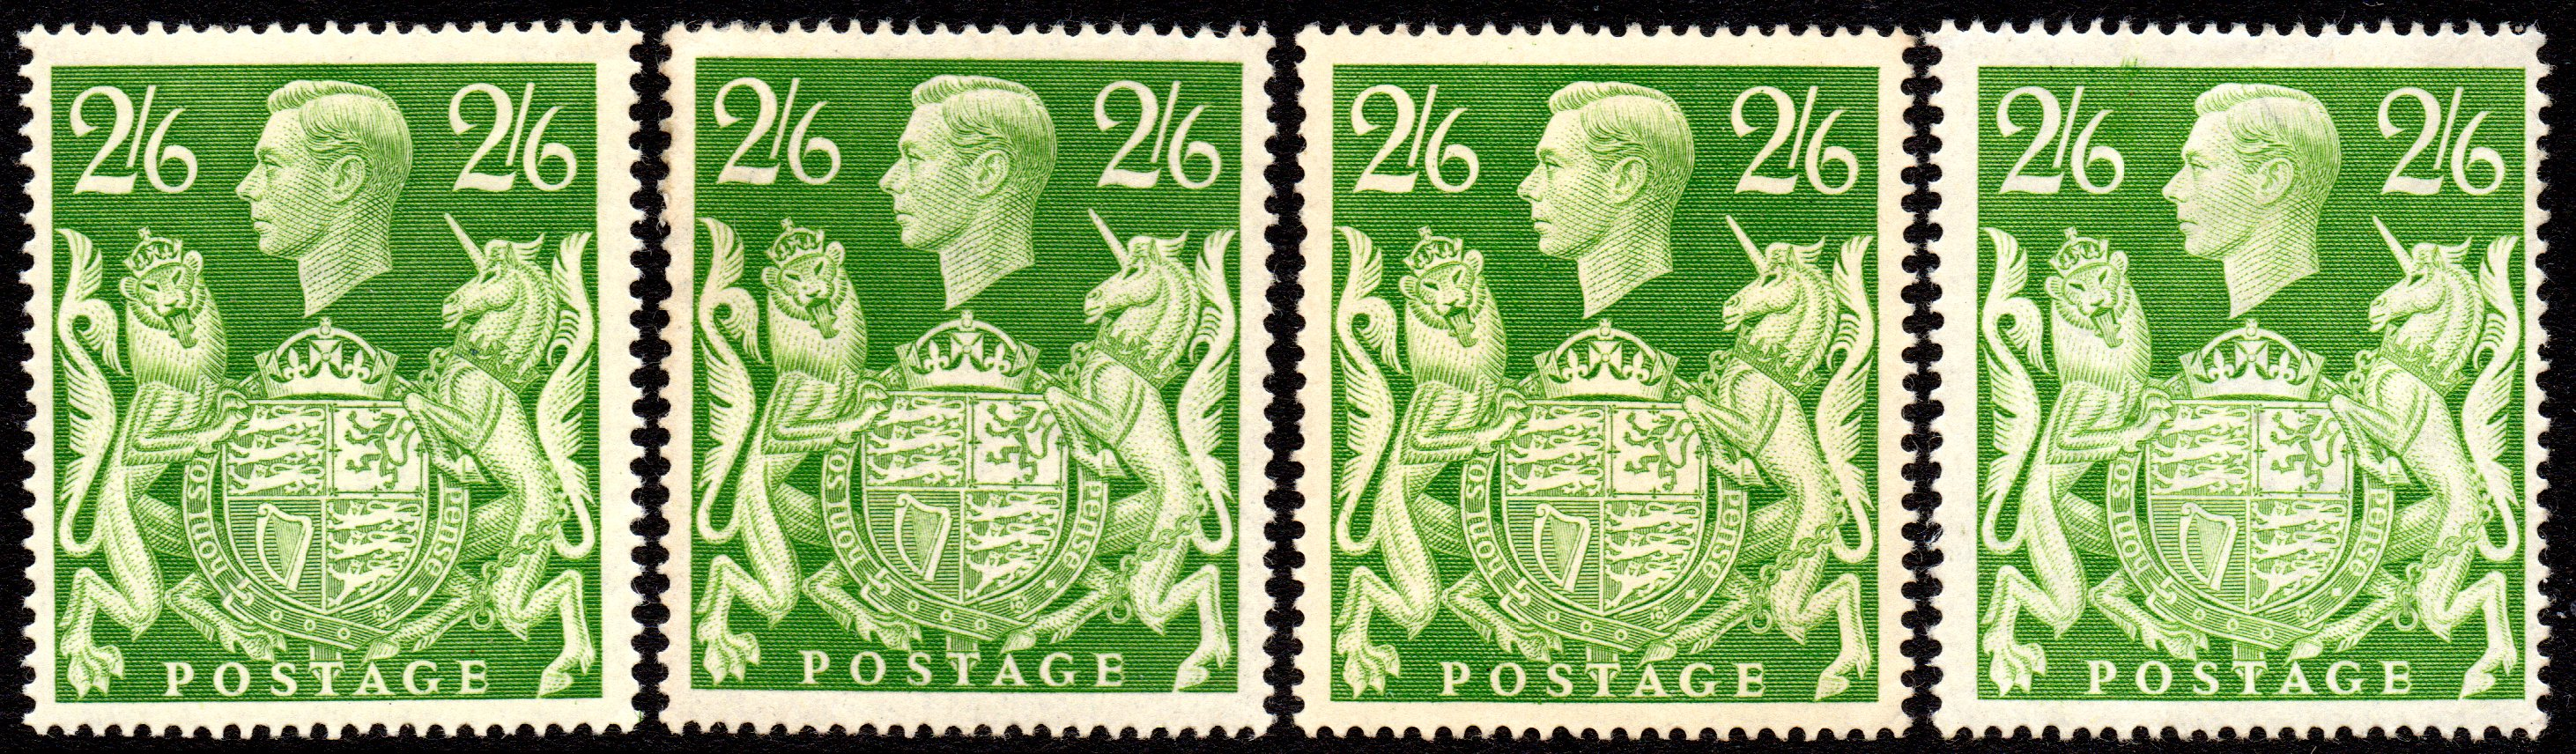 1942 2s6d Yellow-green Mint